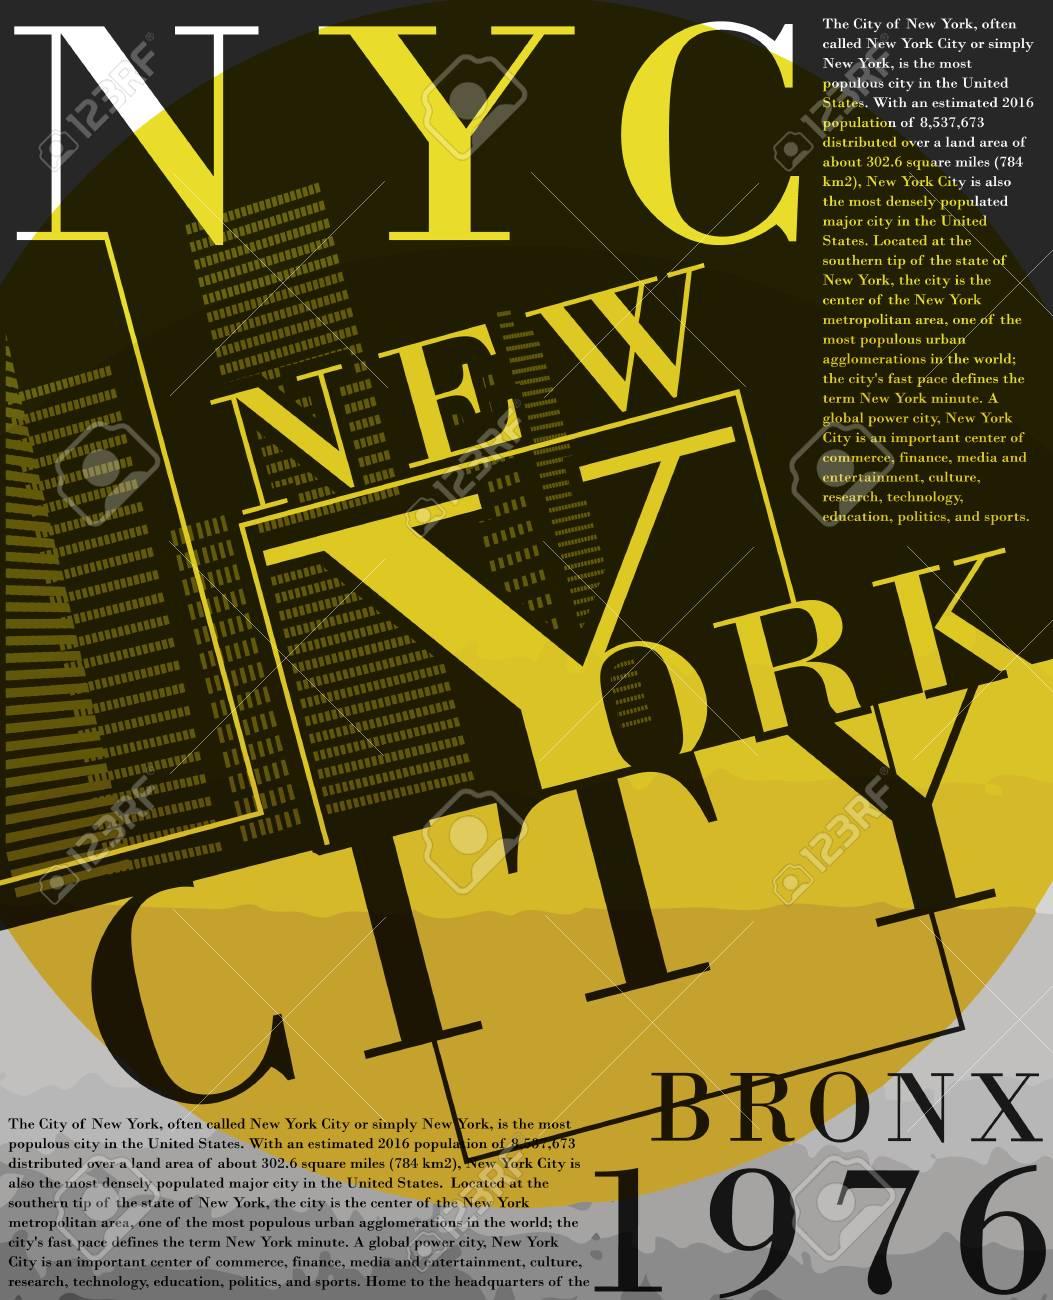 Newyork fashion tee typography graphic design - 88215433